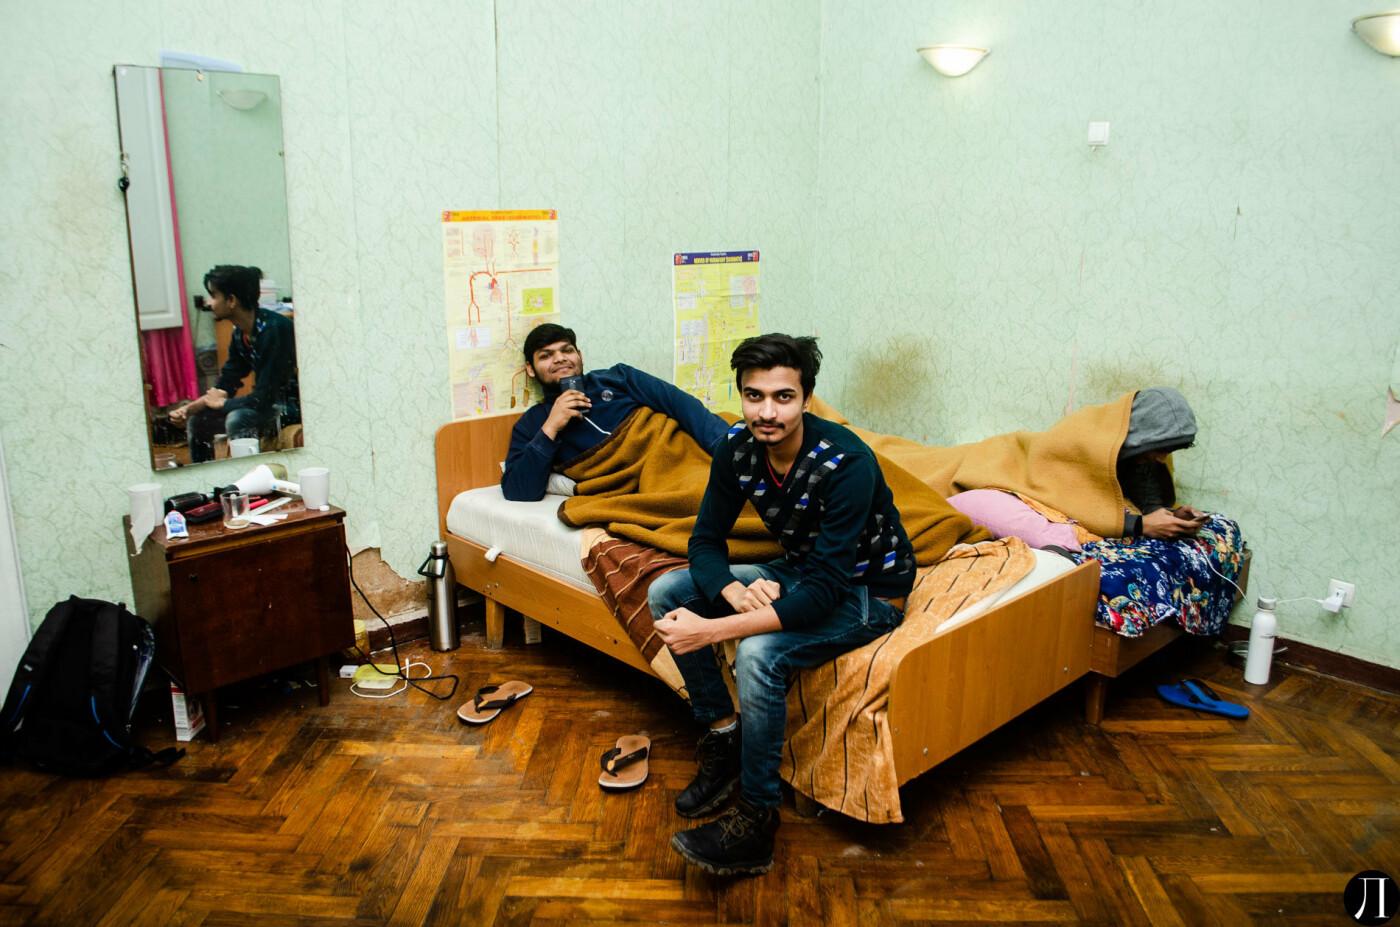 Памятник архитектуры в центре Одессы превратили в общежитие, - ФОТО, фото-7, Фото: Лоция